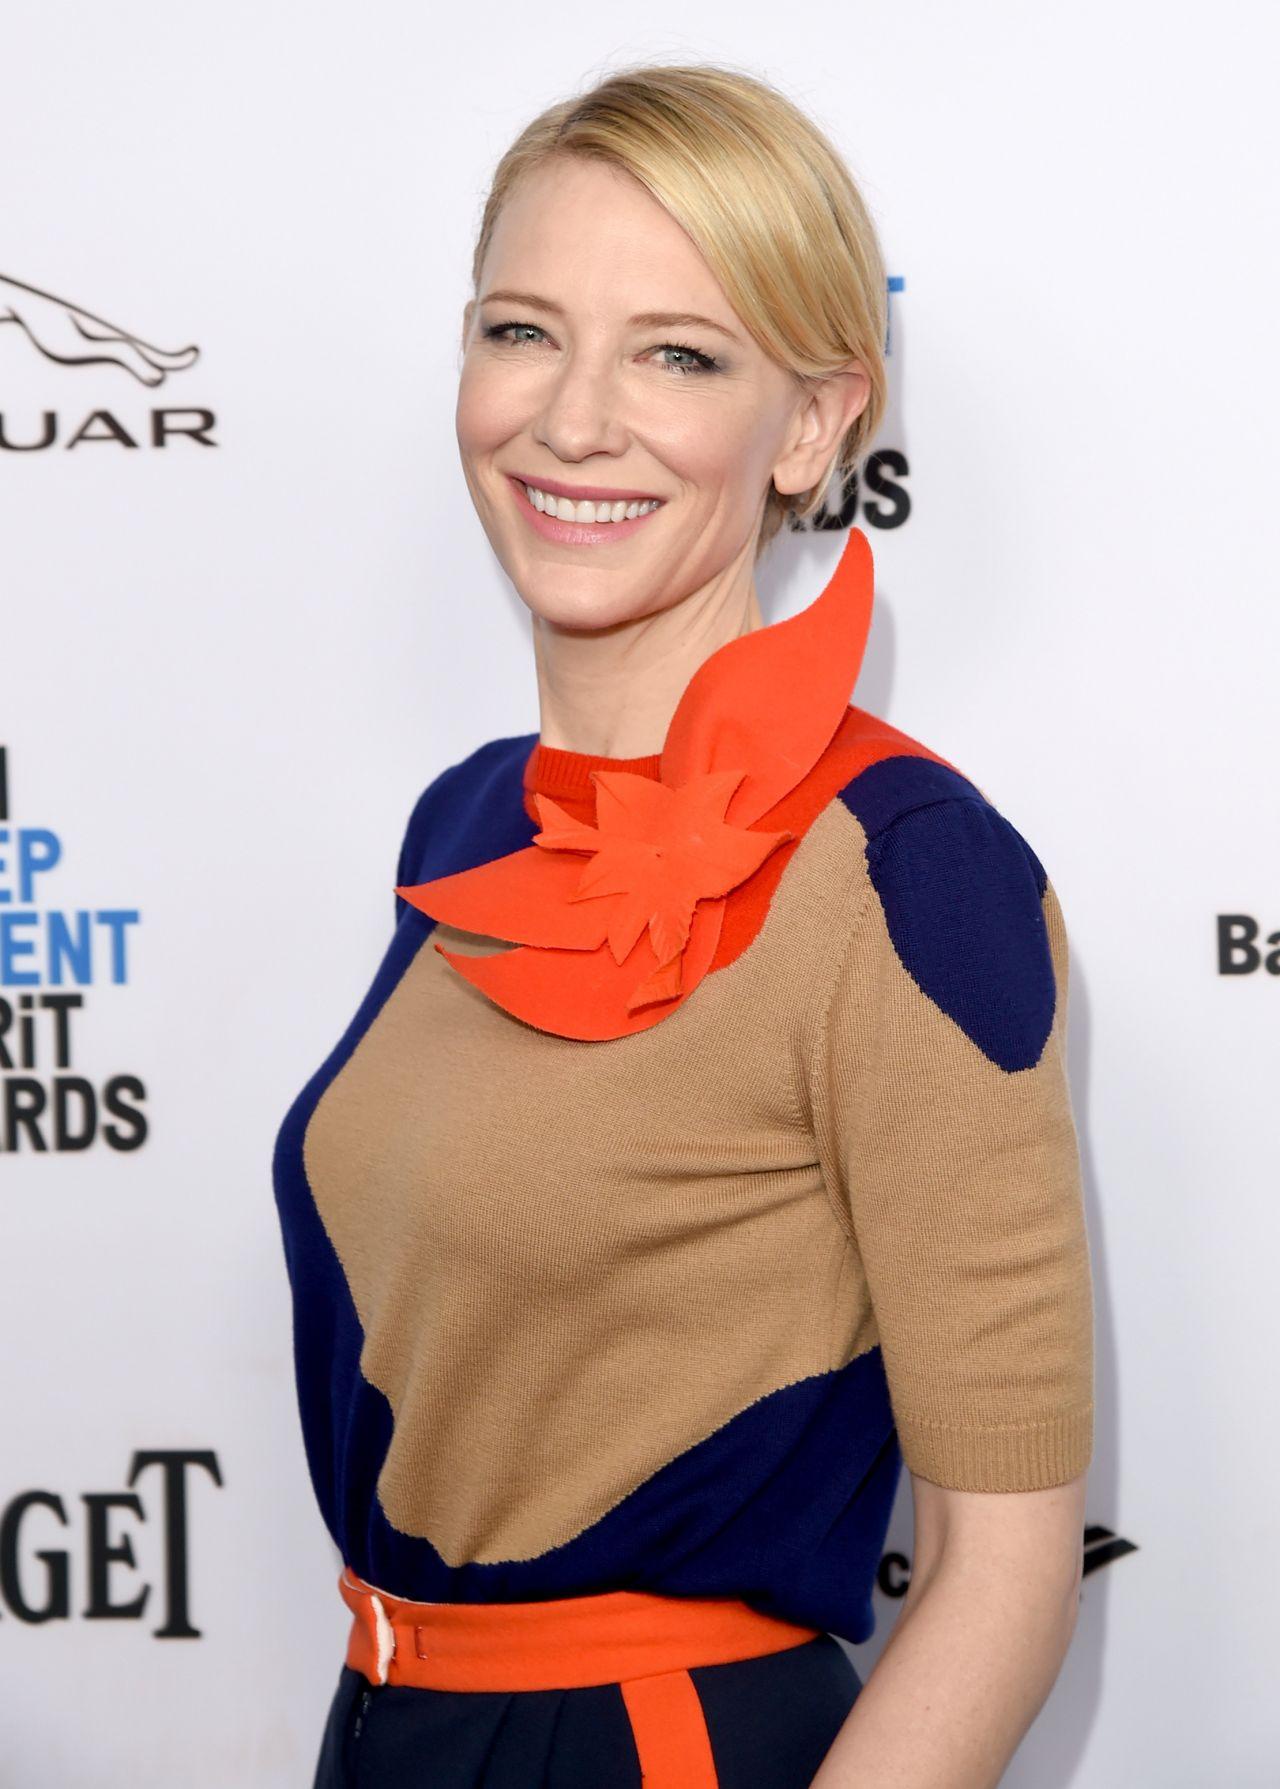 Cate Blanchett - 2016 Film Independent Filmmaker Grant and ... Cate Blanchett 2016